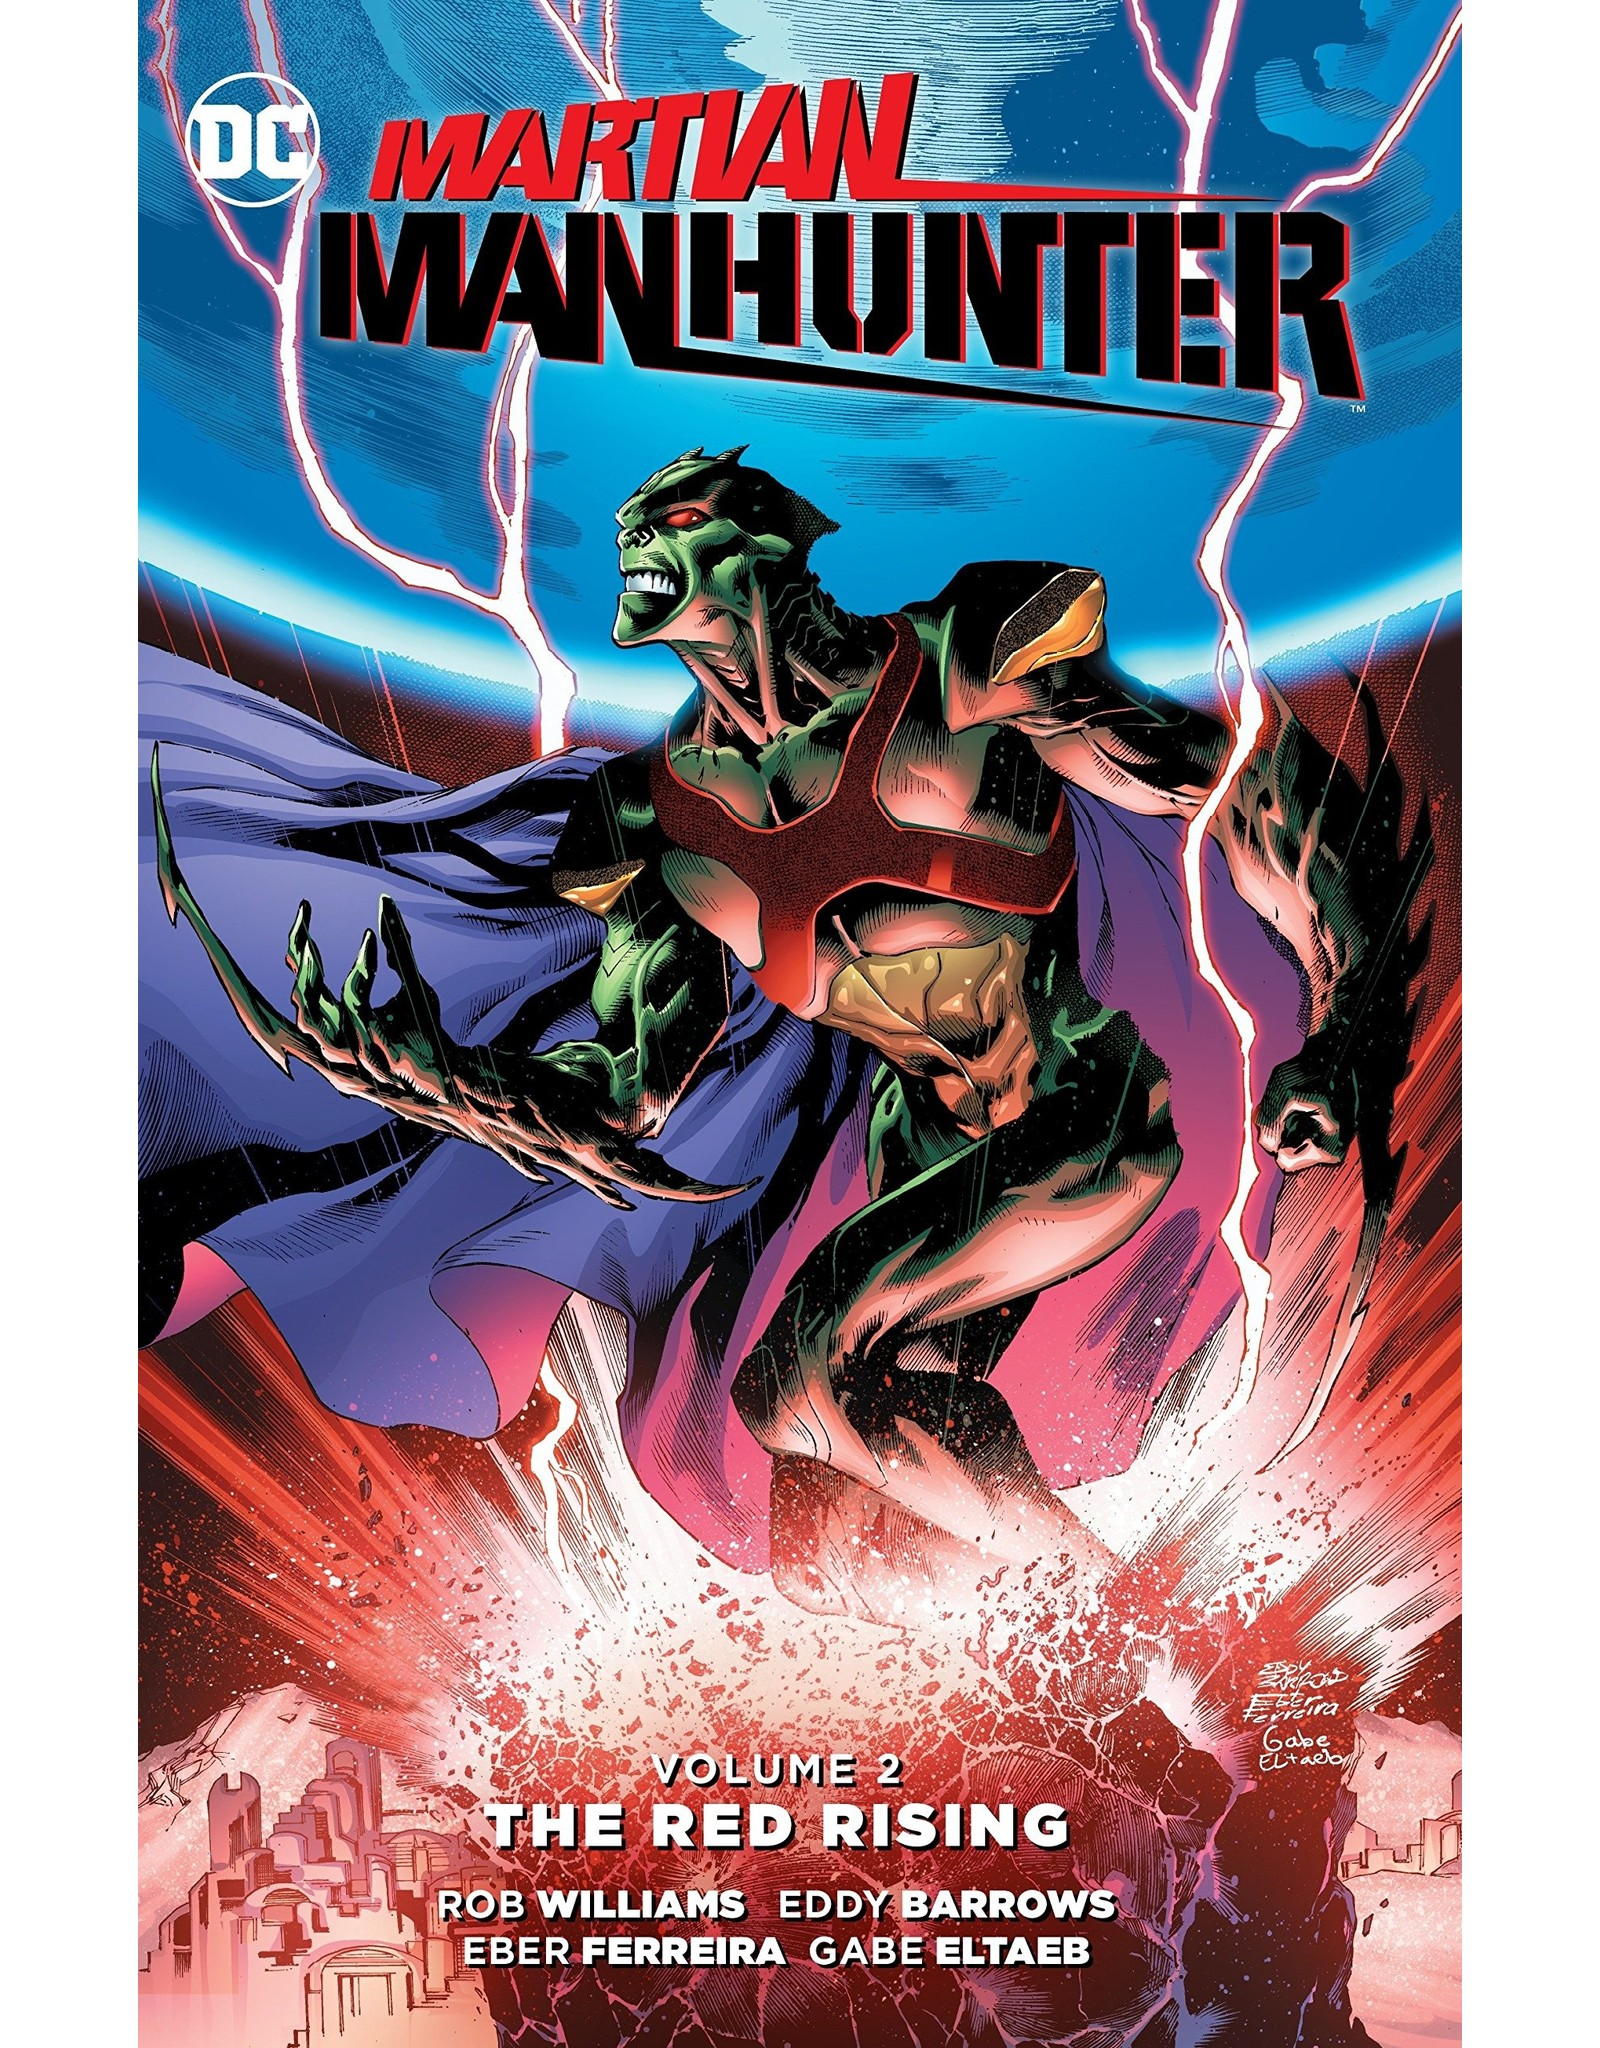 DC COMICS MARTIAN MANHUNTER TP VOL 02 THE RED RISING